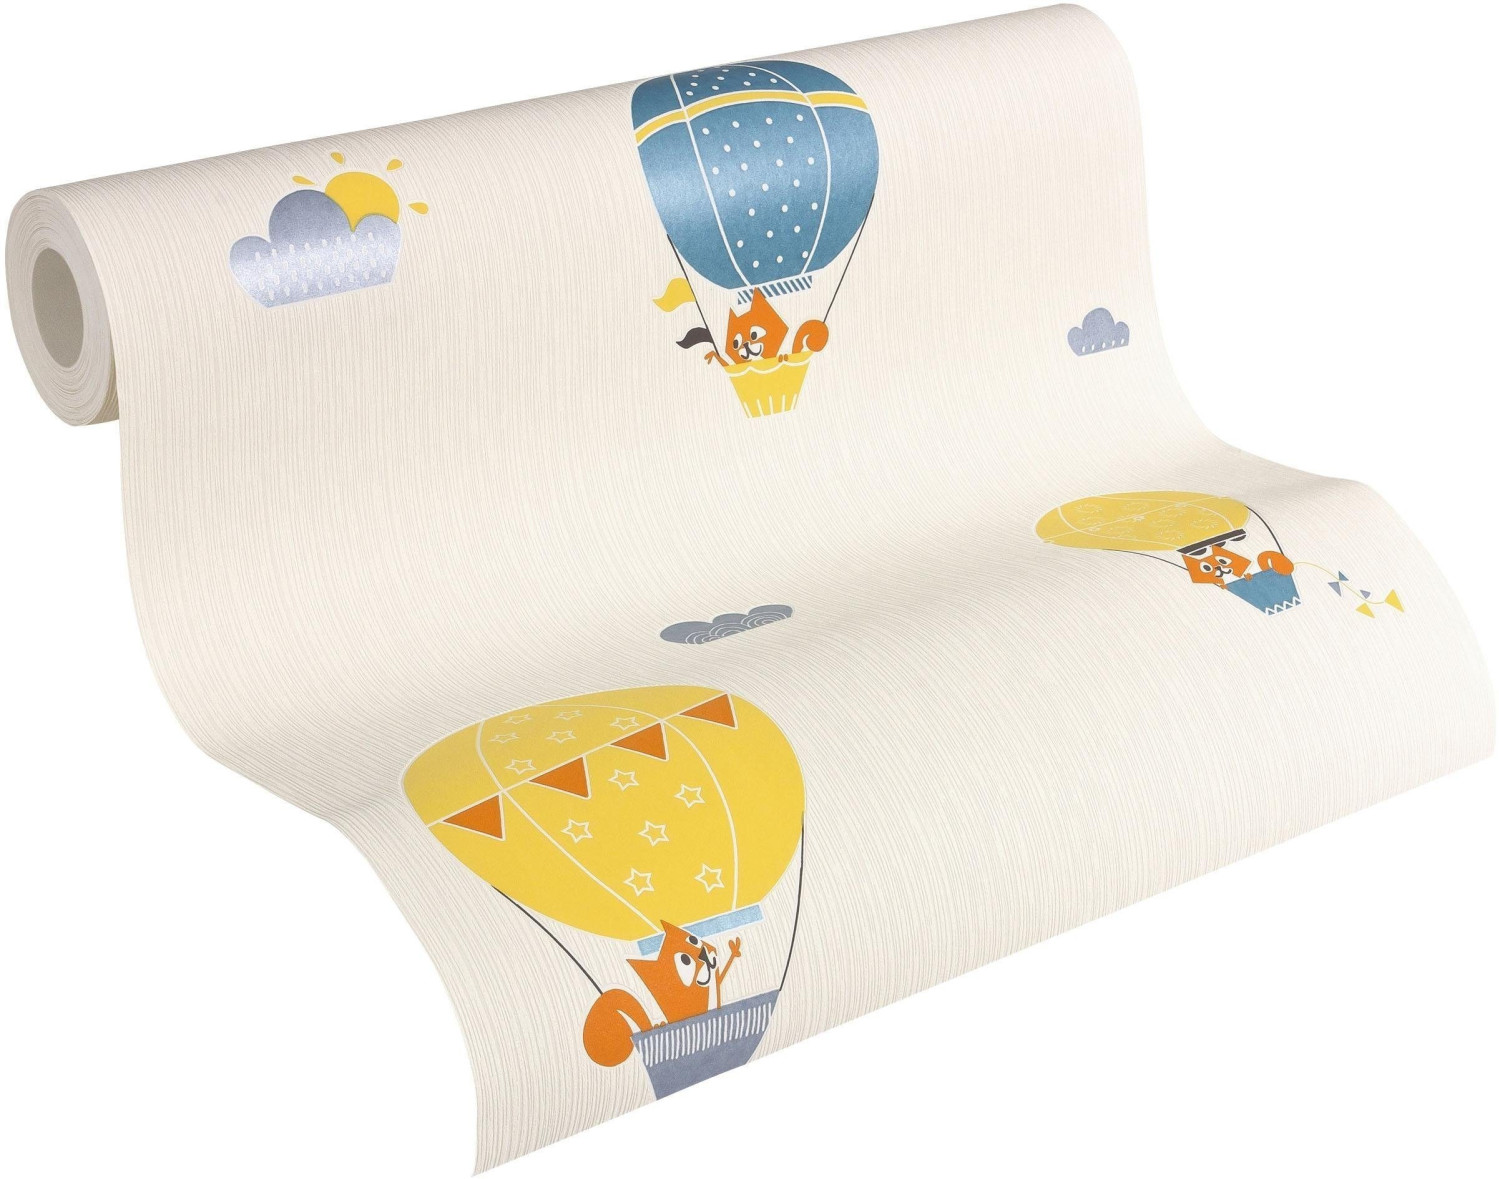 A.S. Creation Esprit Home Kids Flying Balloon orange (2952)